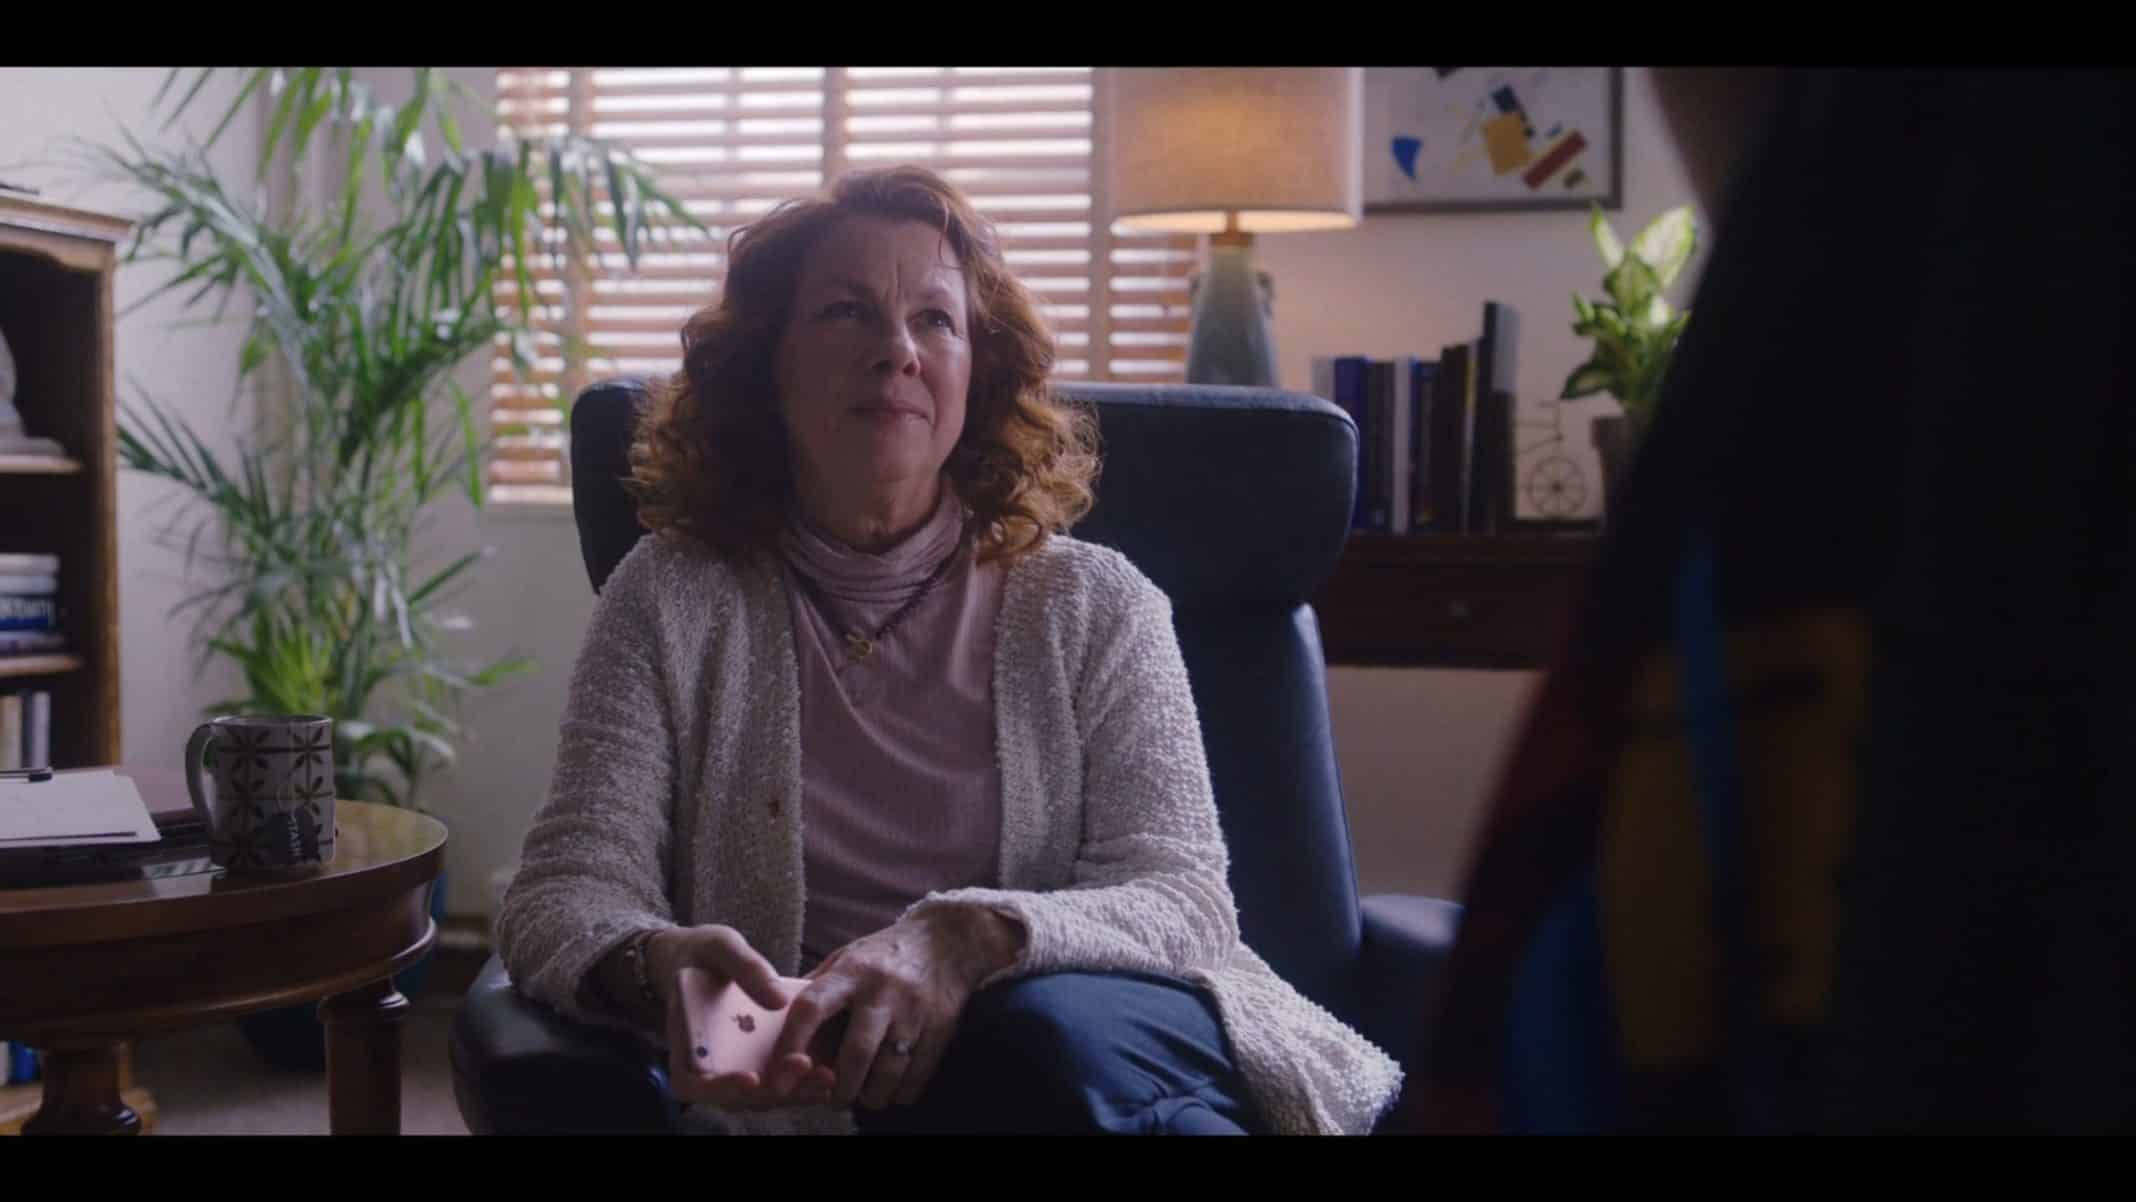 Therapist (Siobhan Fallon Hogan) speaking to Darby.